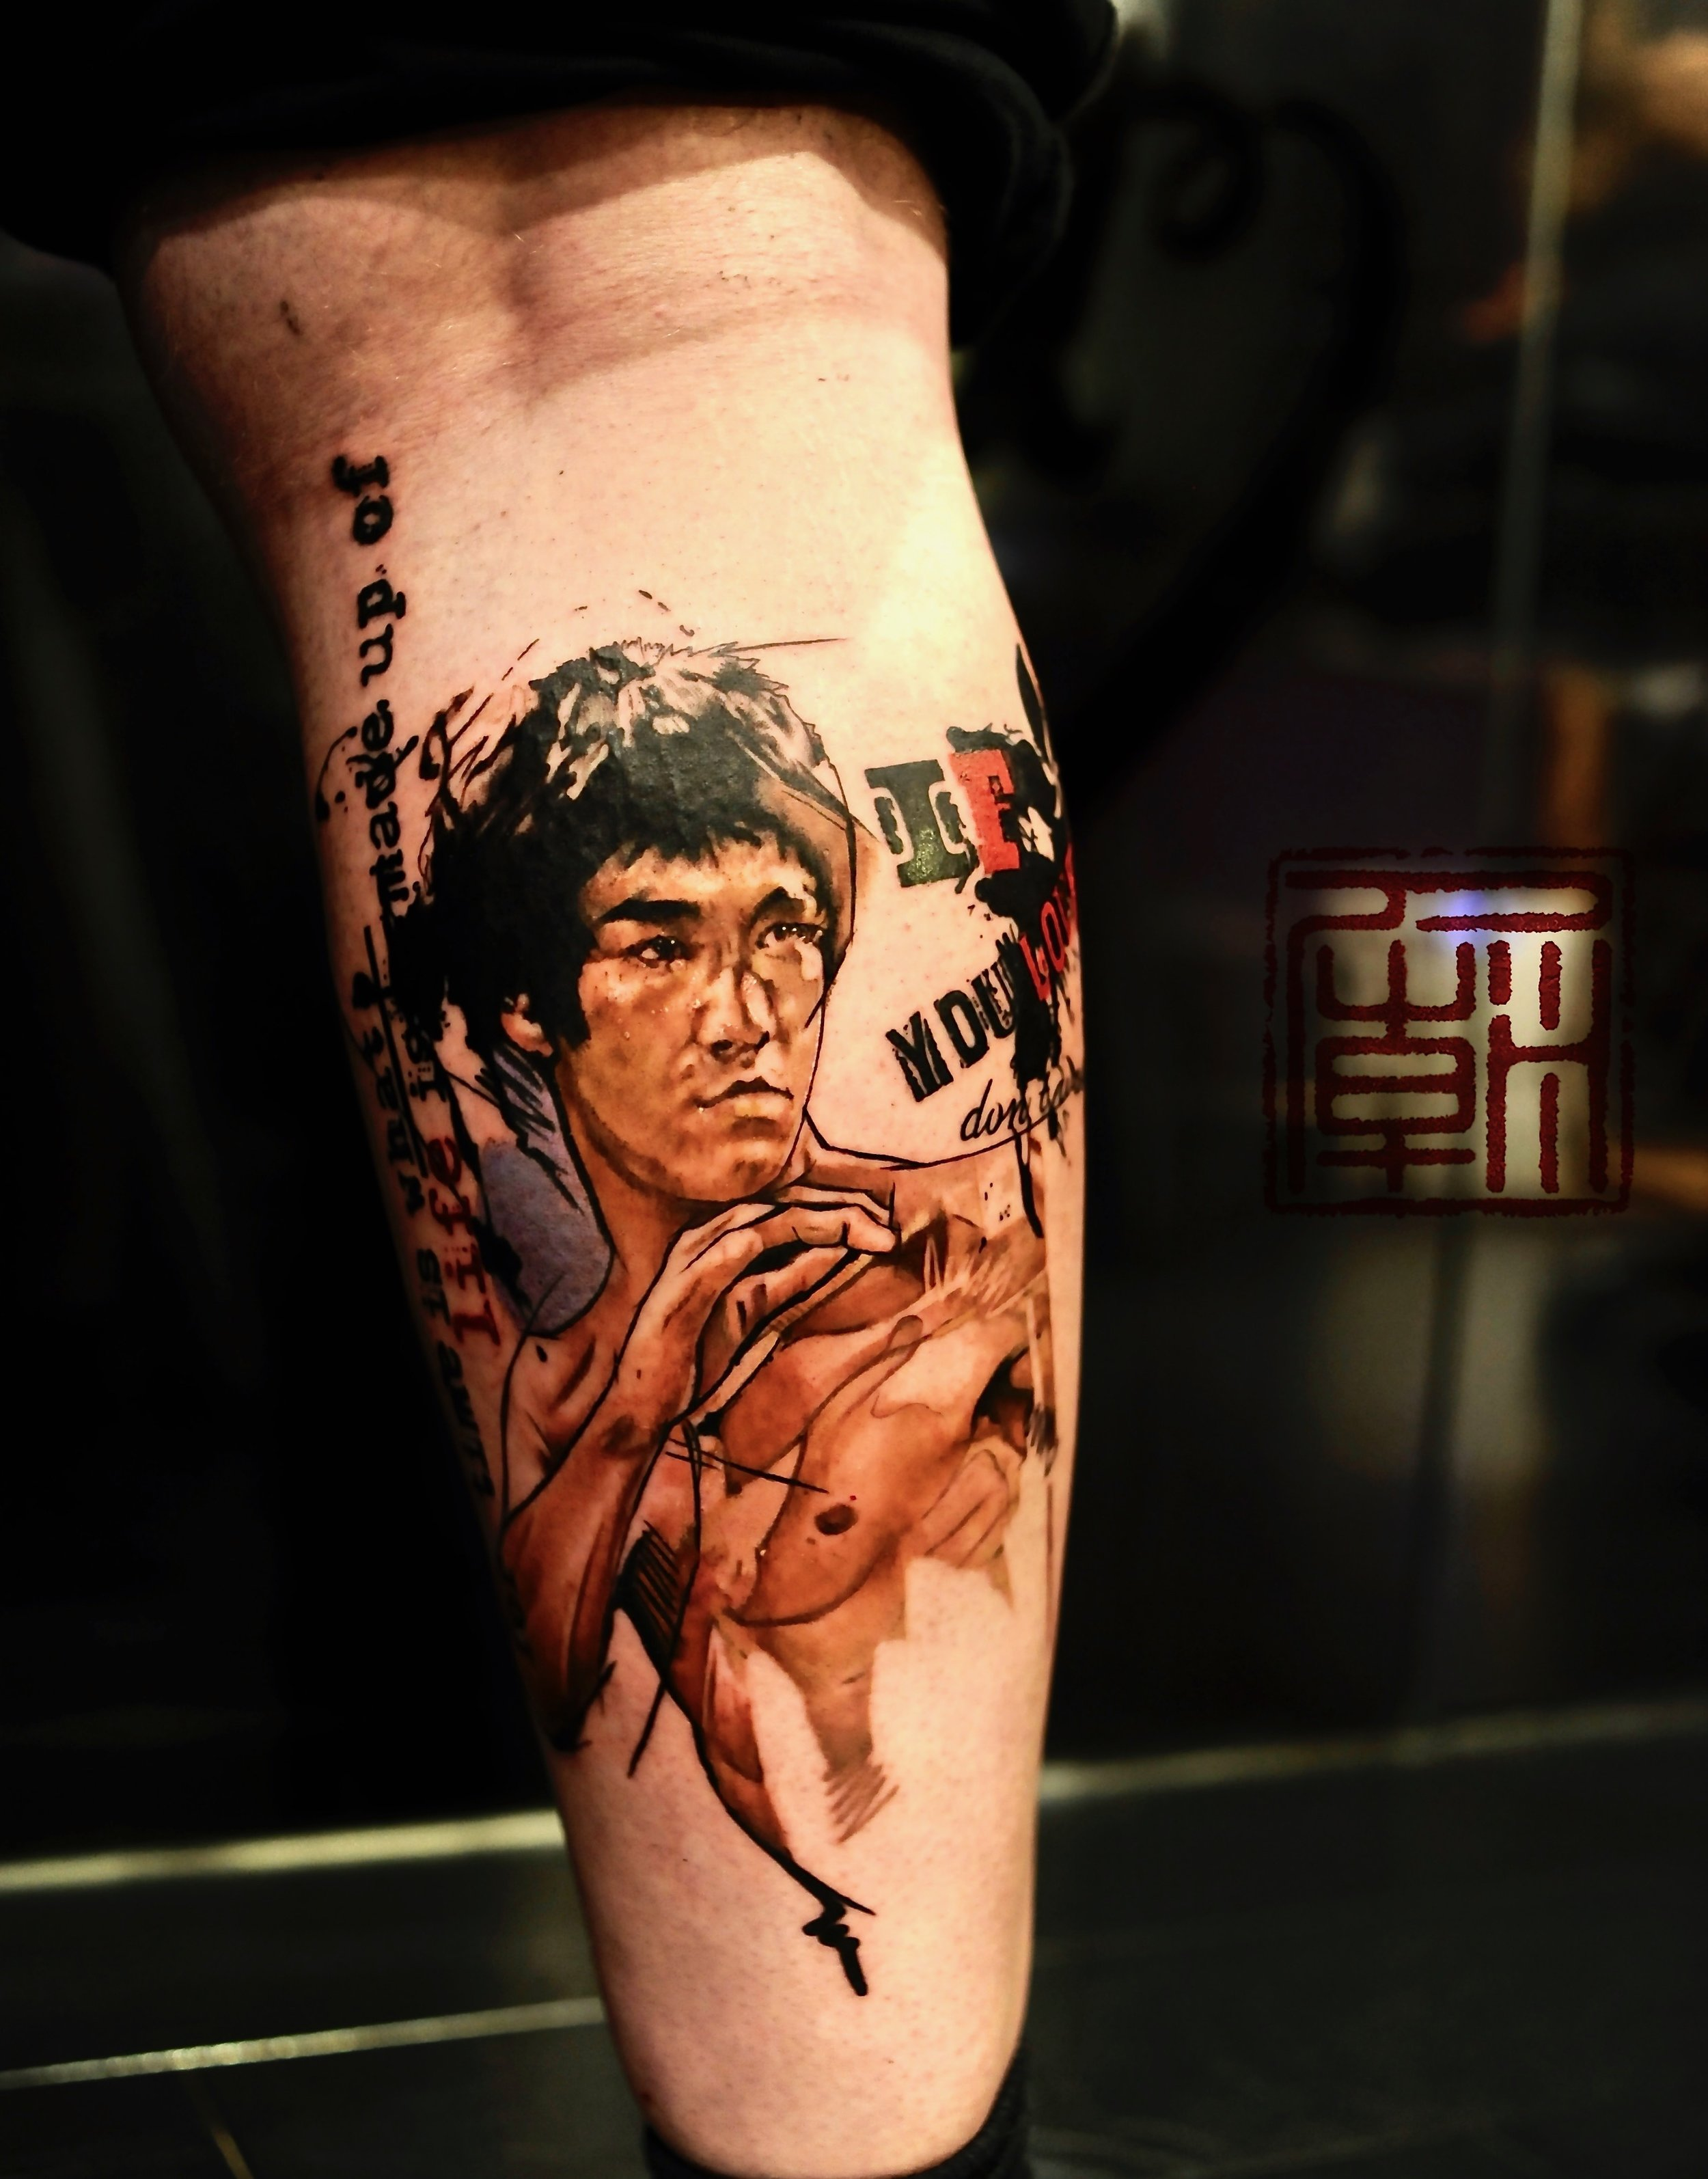 Anttis Bruce Lee Dedication Jamie Wang Tattoo Temple Hong Kong.jpg